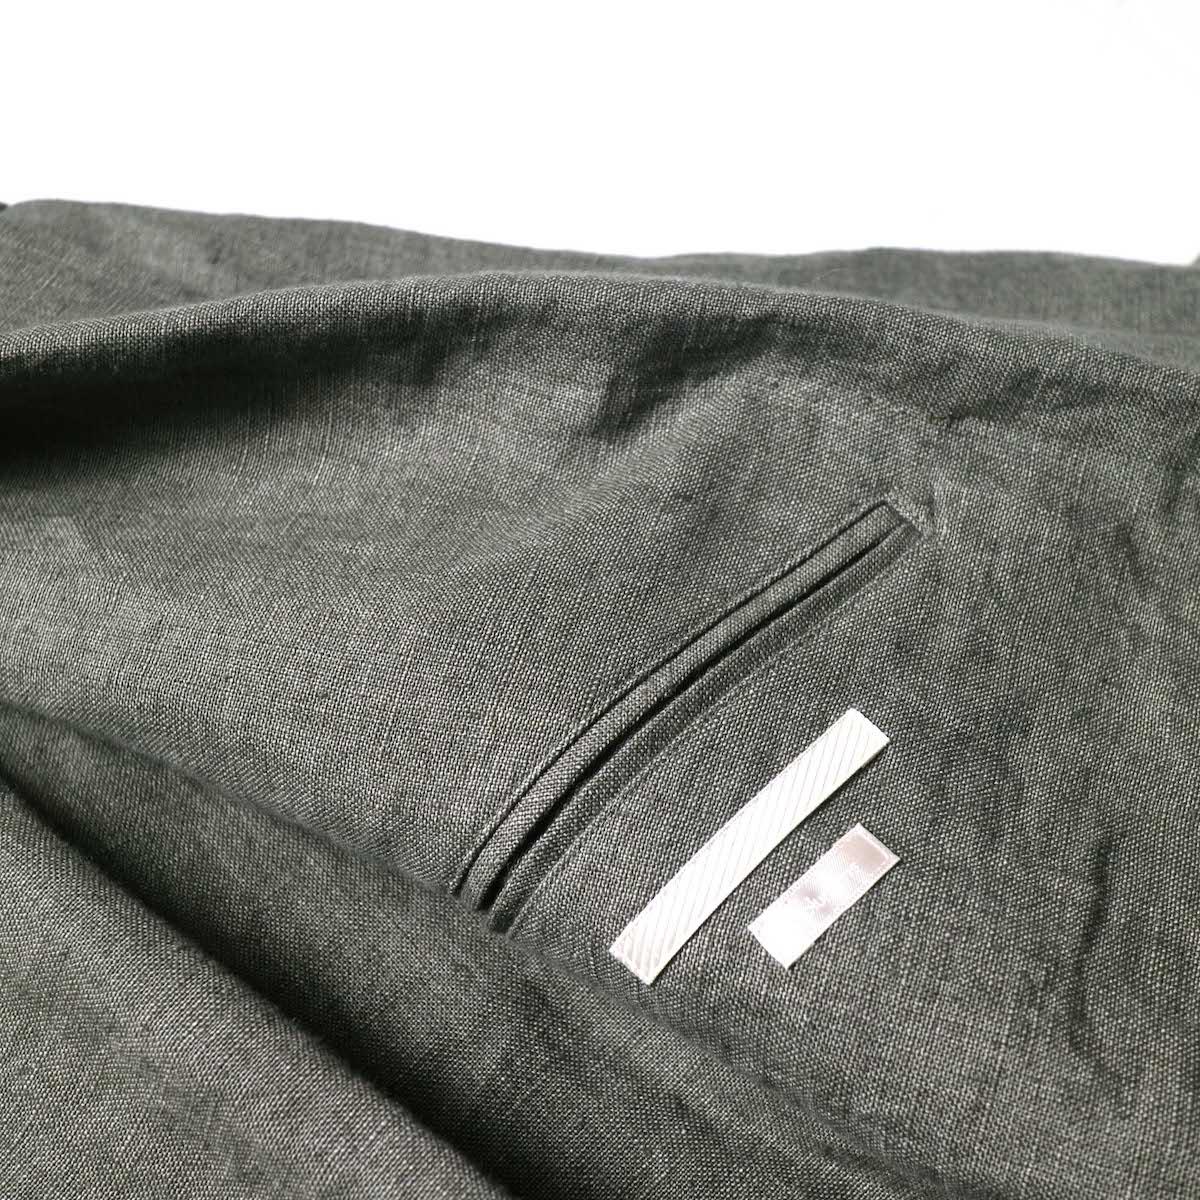 blurhms / Wash Linen Cardigan Jacket (KhakiGrey)内ポケット